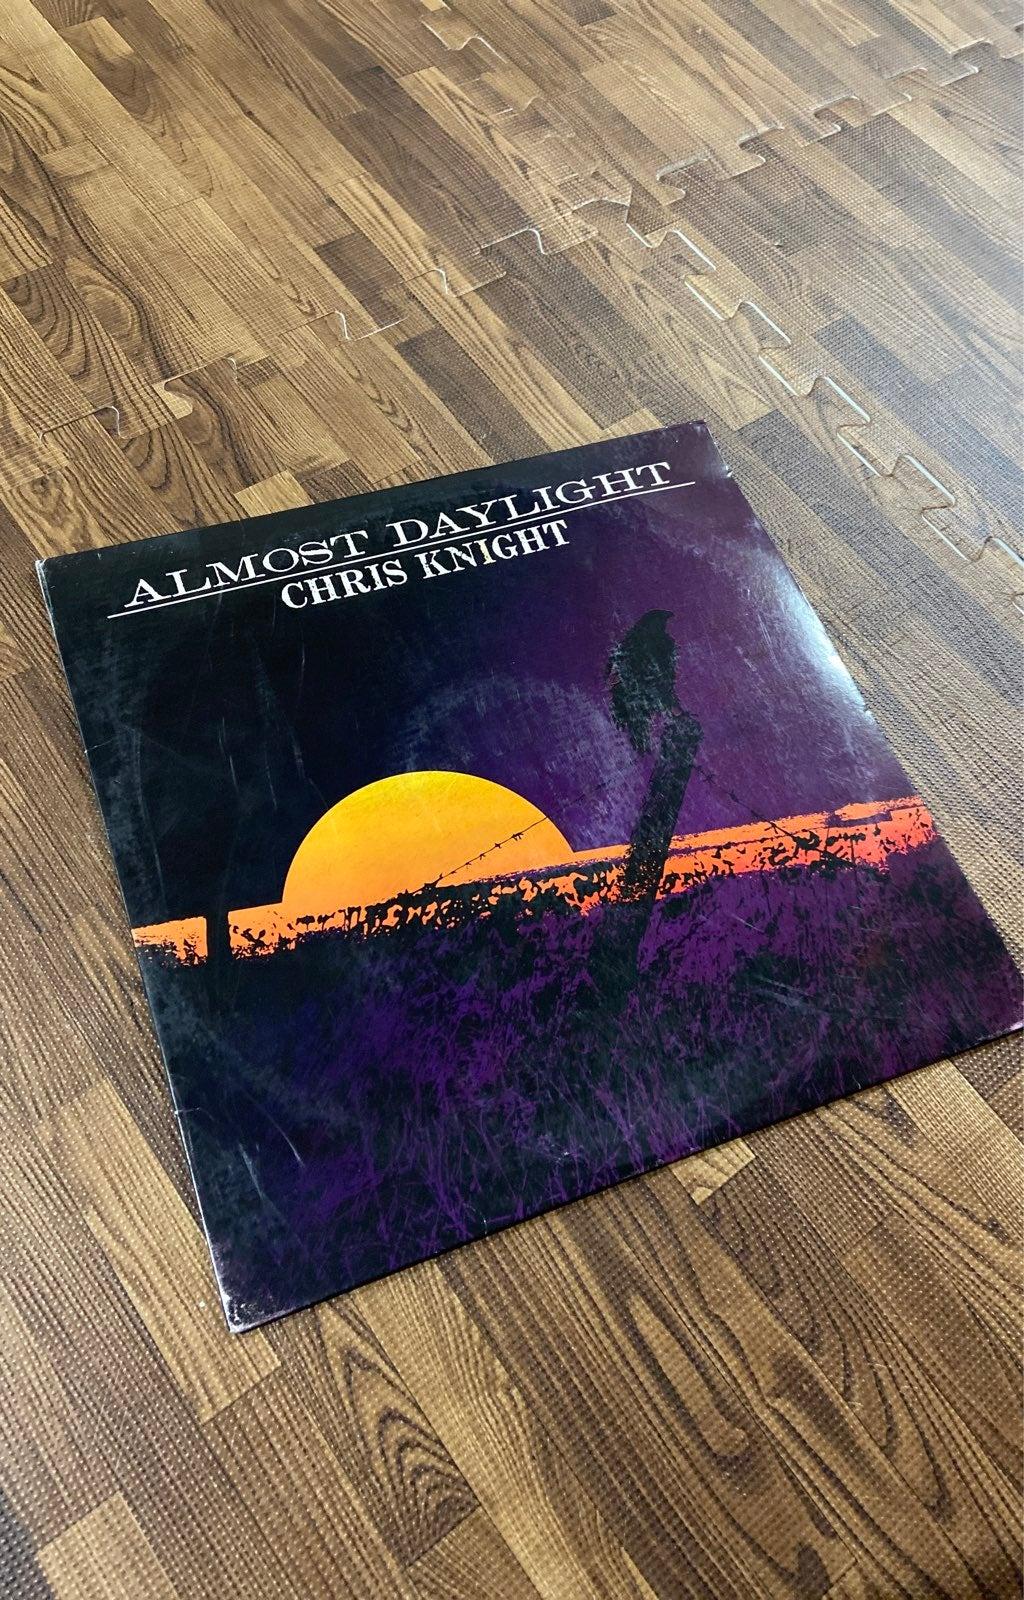 Almost Daylight Chris Knight Vinyl